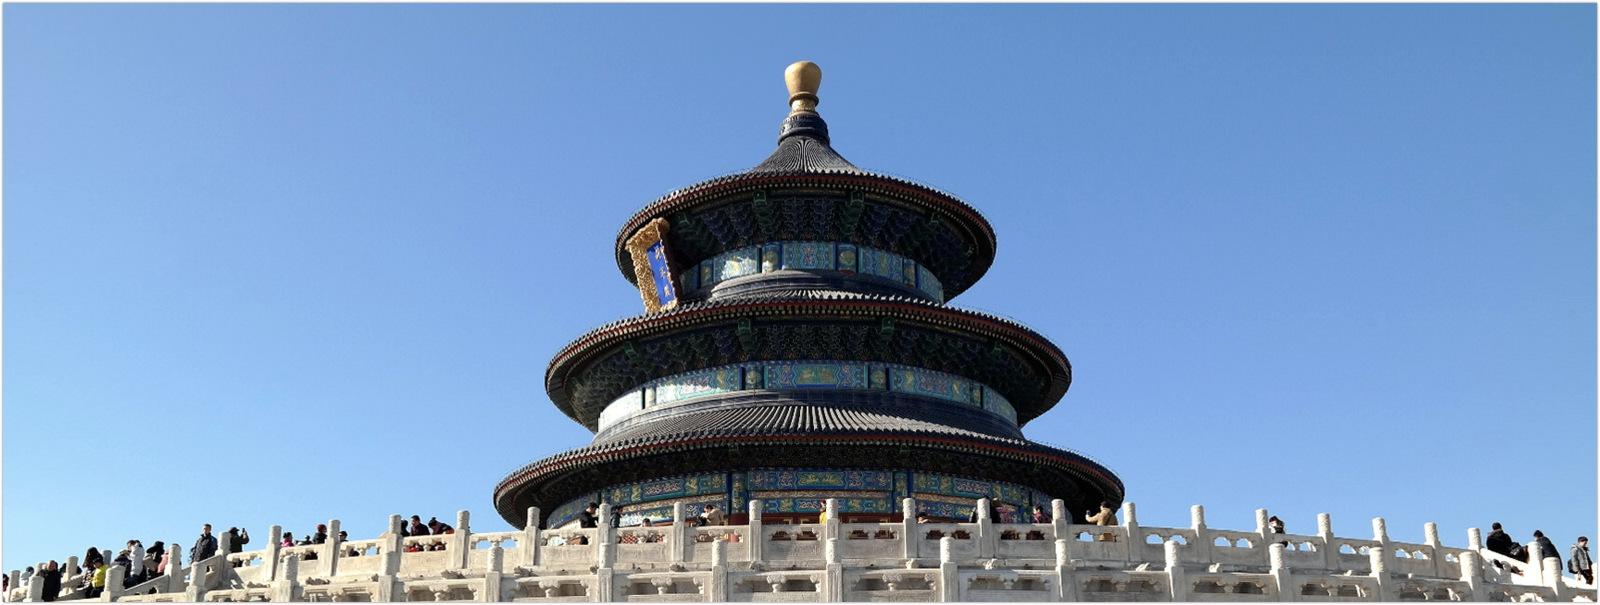 China - Beijing - Temple of Heaven